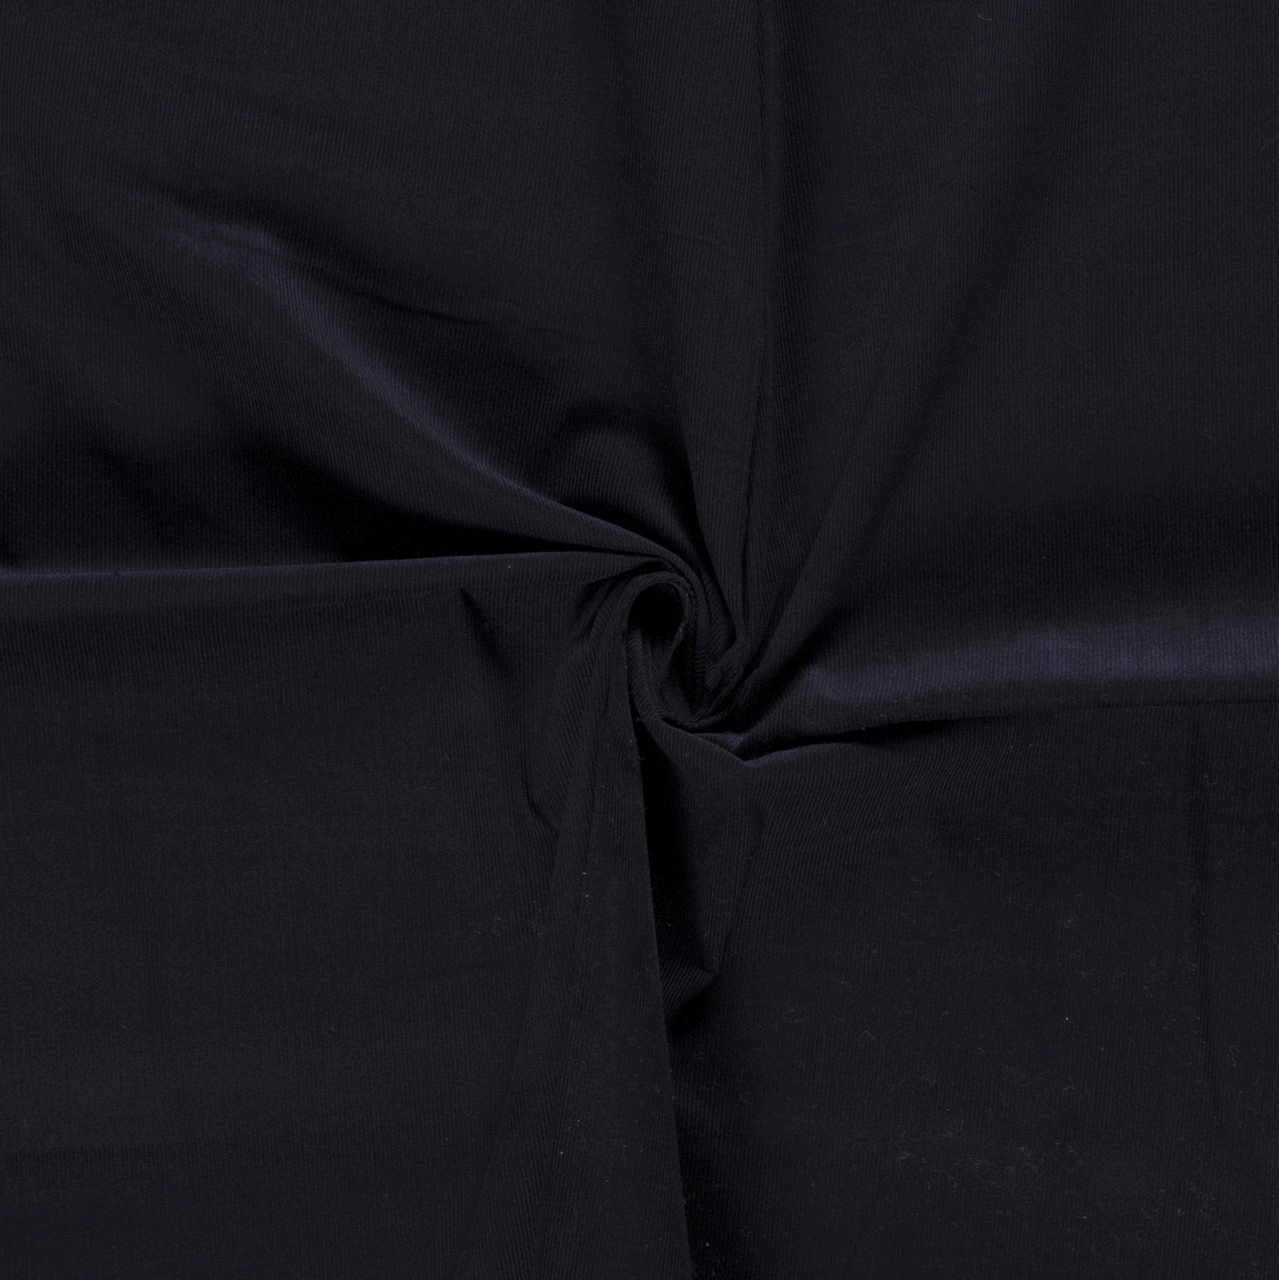 Navy Blue Fine baby cord Fine Needlecord 100/% cotton dressmaking  UK Shop 9471008 Fine Corduroy